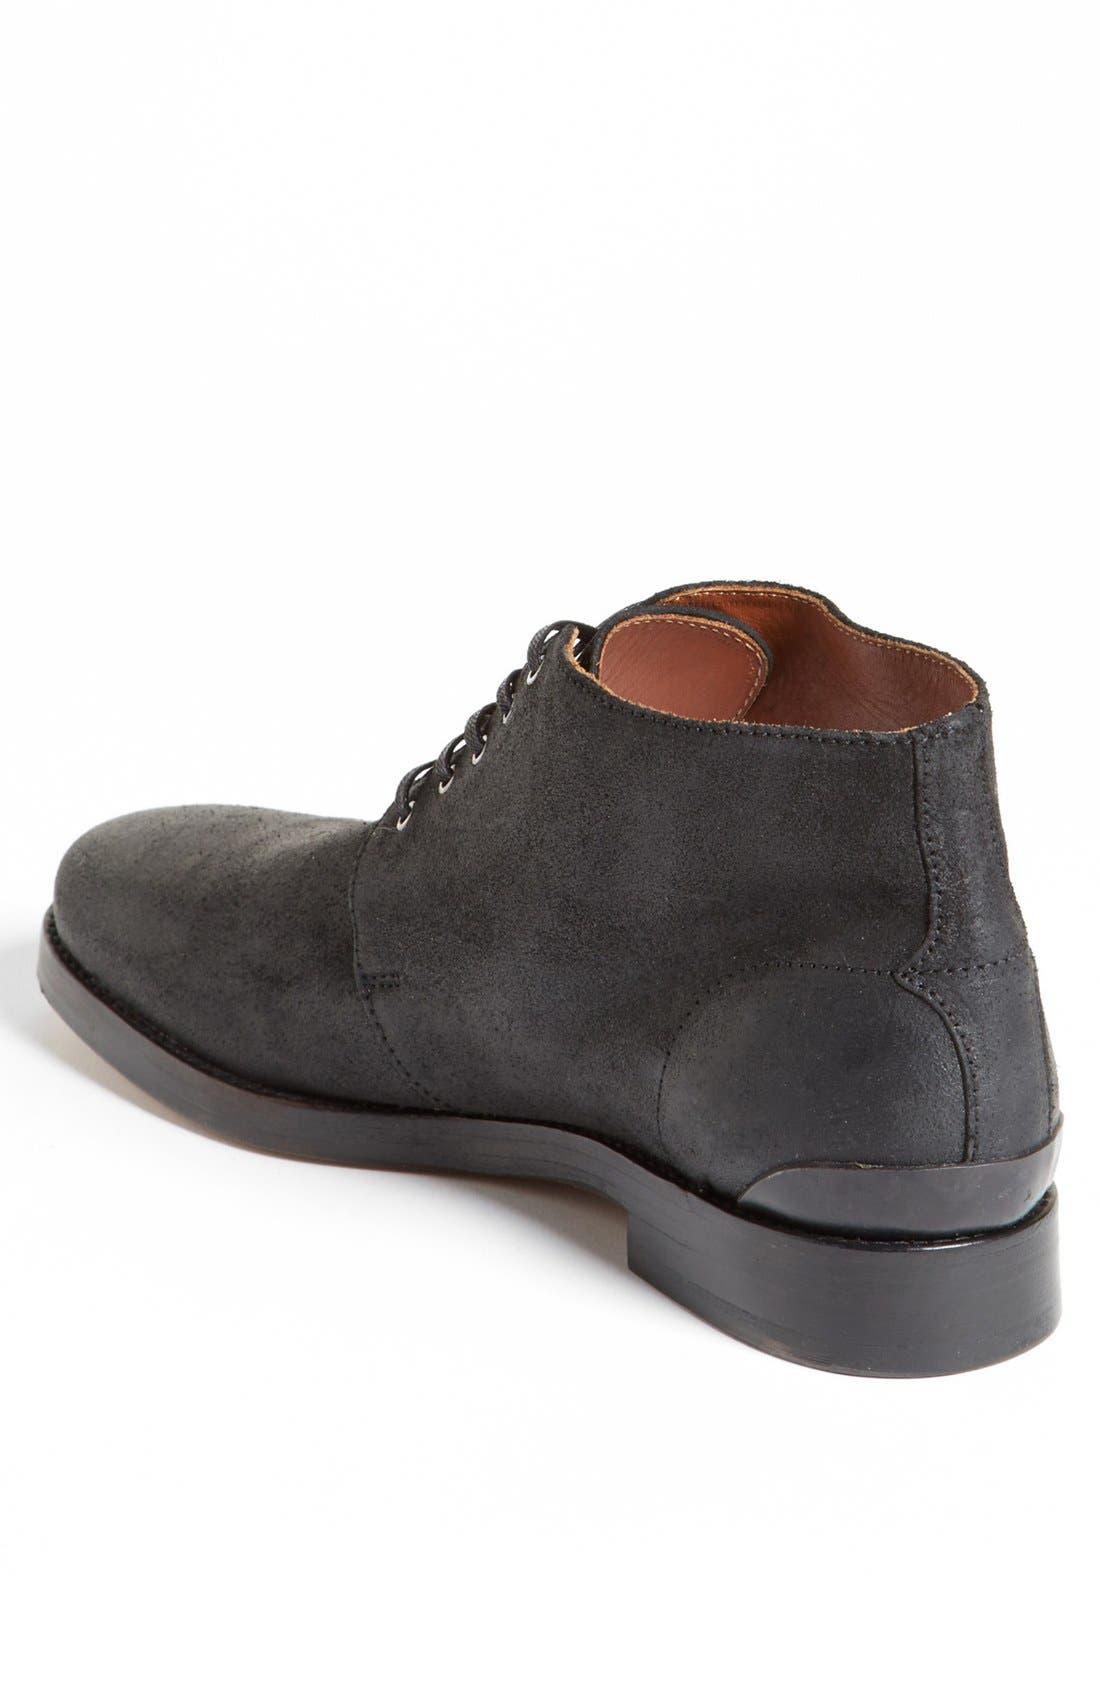 Alternate Image 2  - rag & bone 'Archer' Plain Toe Suede Boot